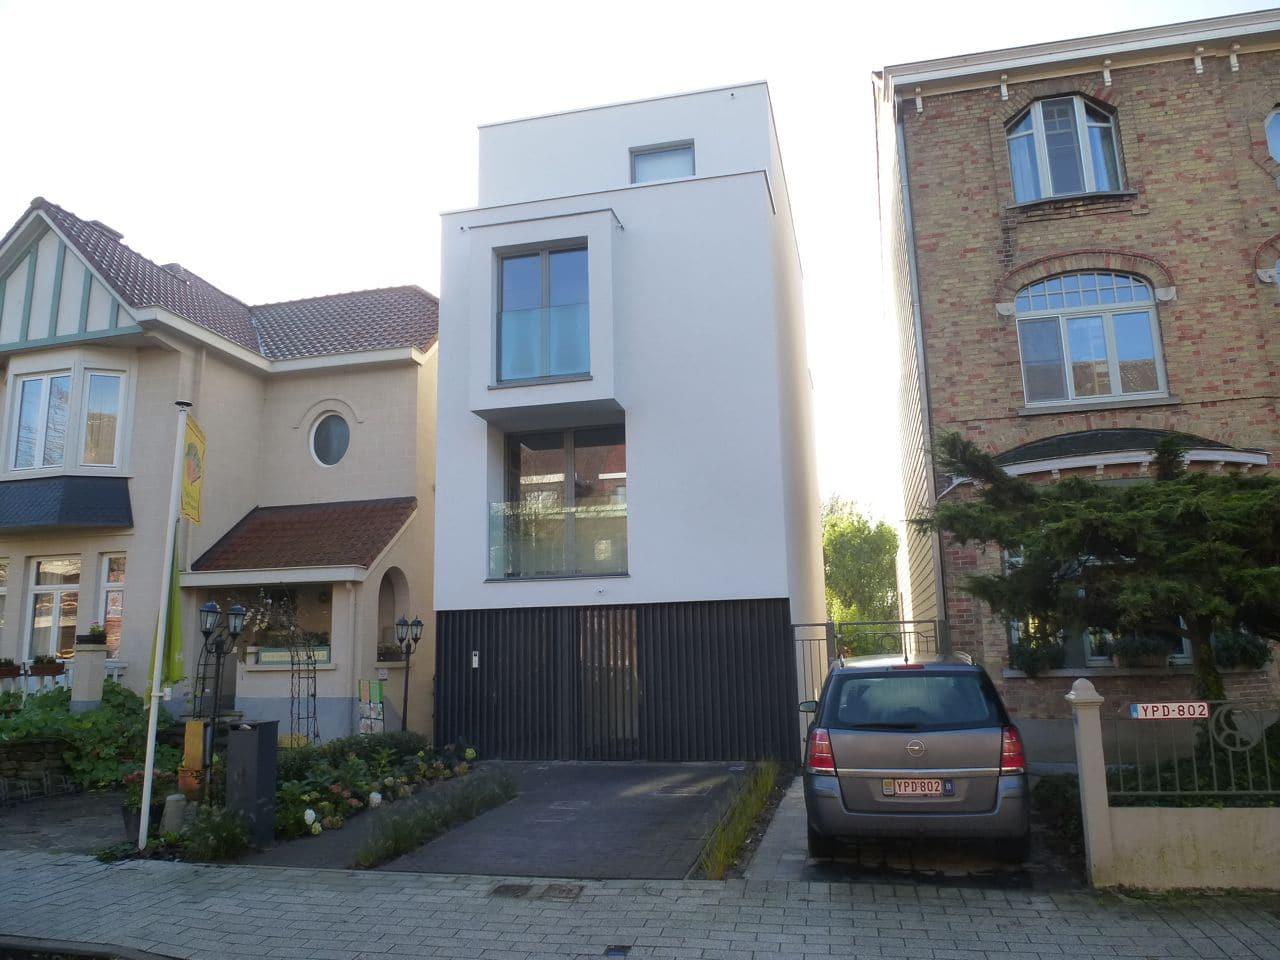 P1080582 | Baeyens & Beck architecten Gent | architect nieuwbouw renovatie interieur | high end | architectenbureau